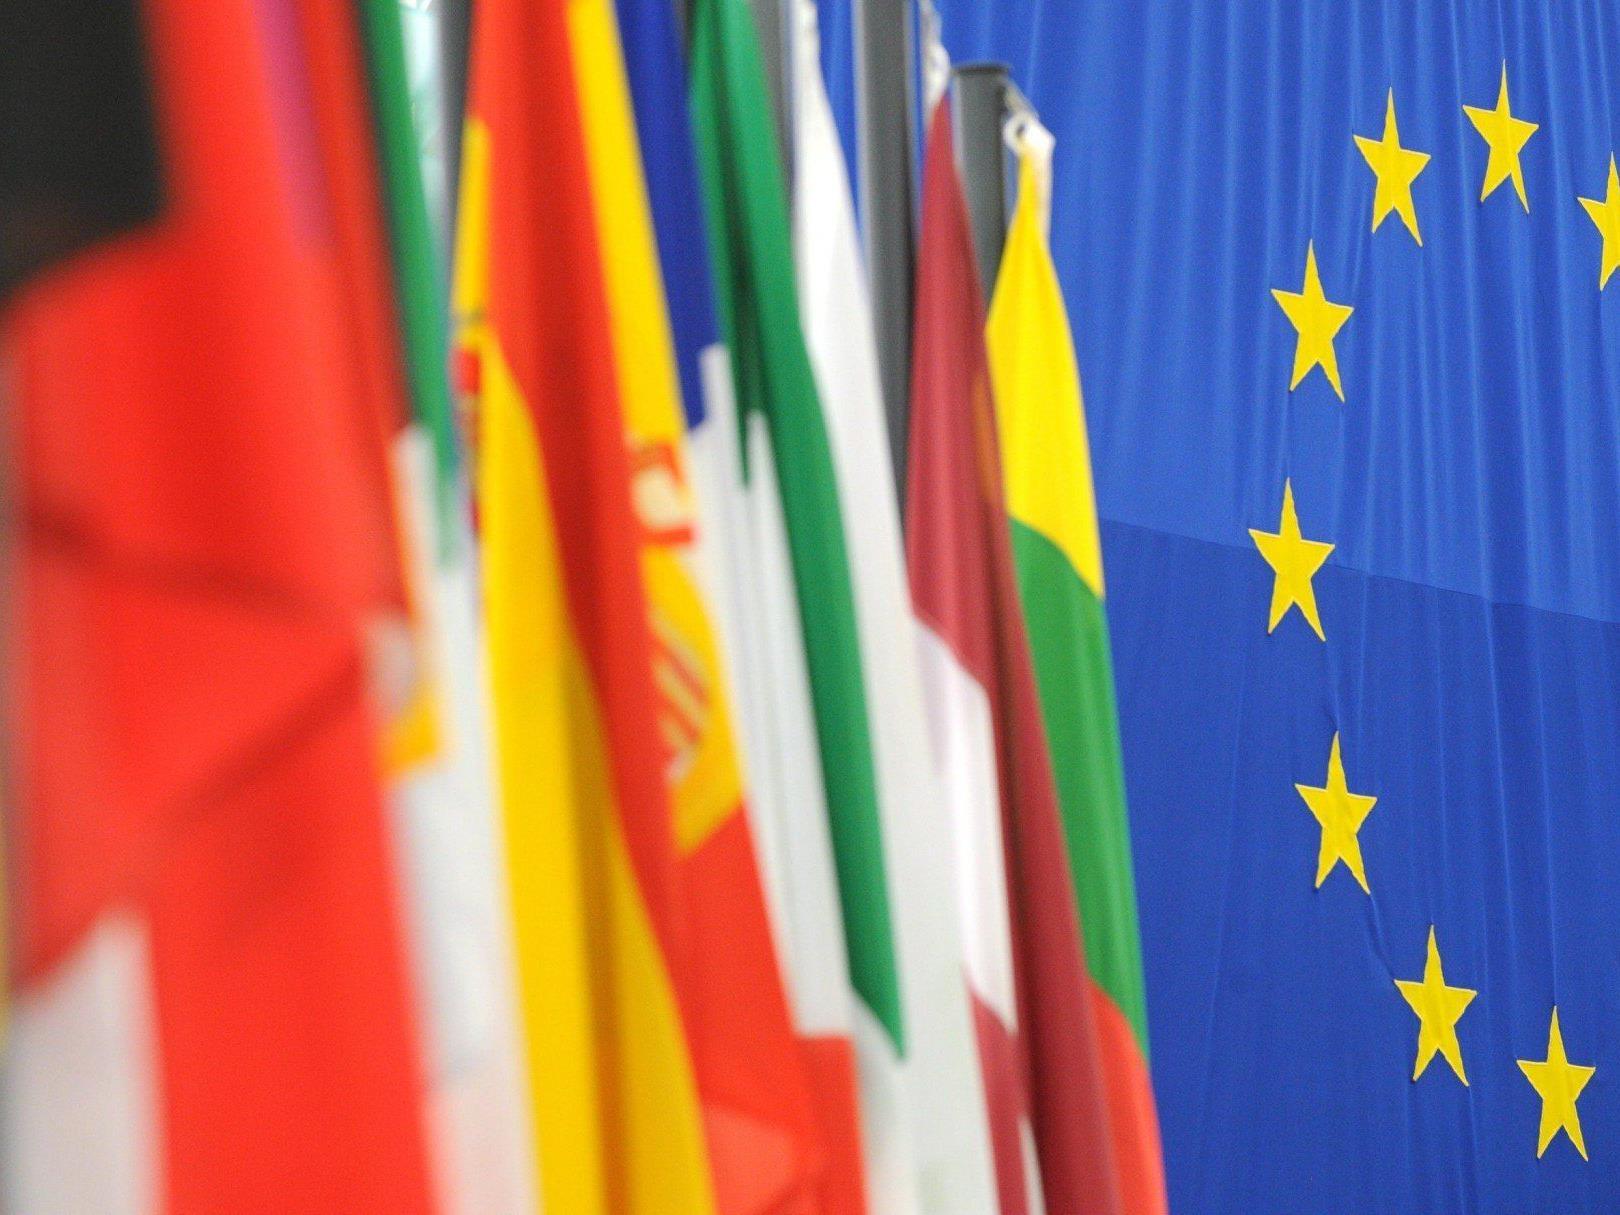 EU-Wahl: Erste Ergebnisse